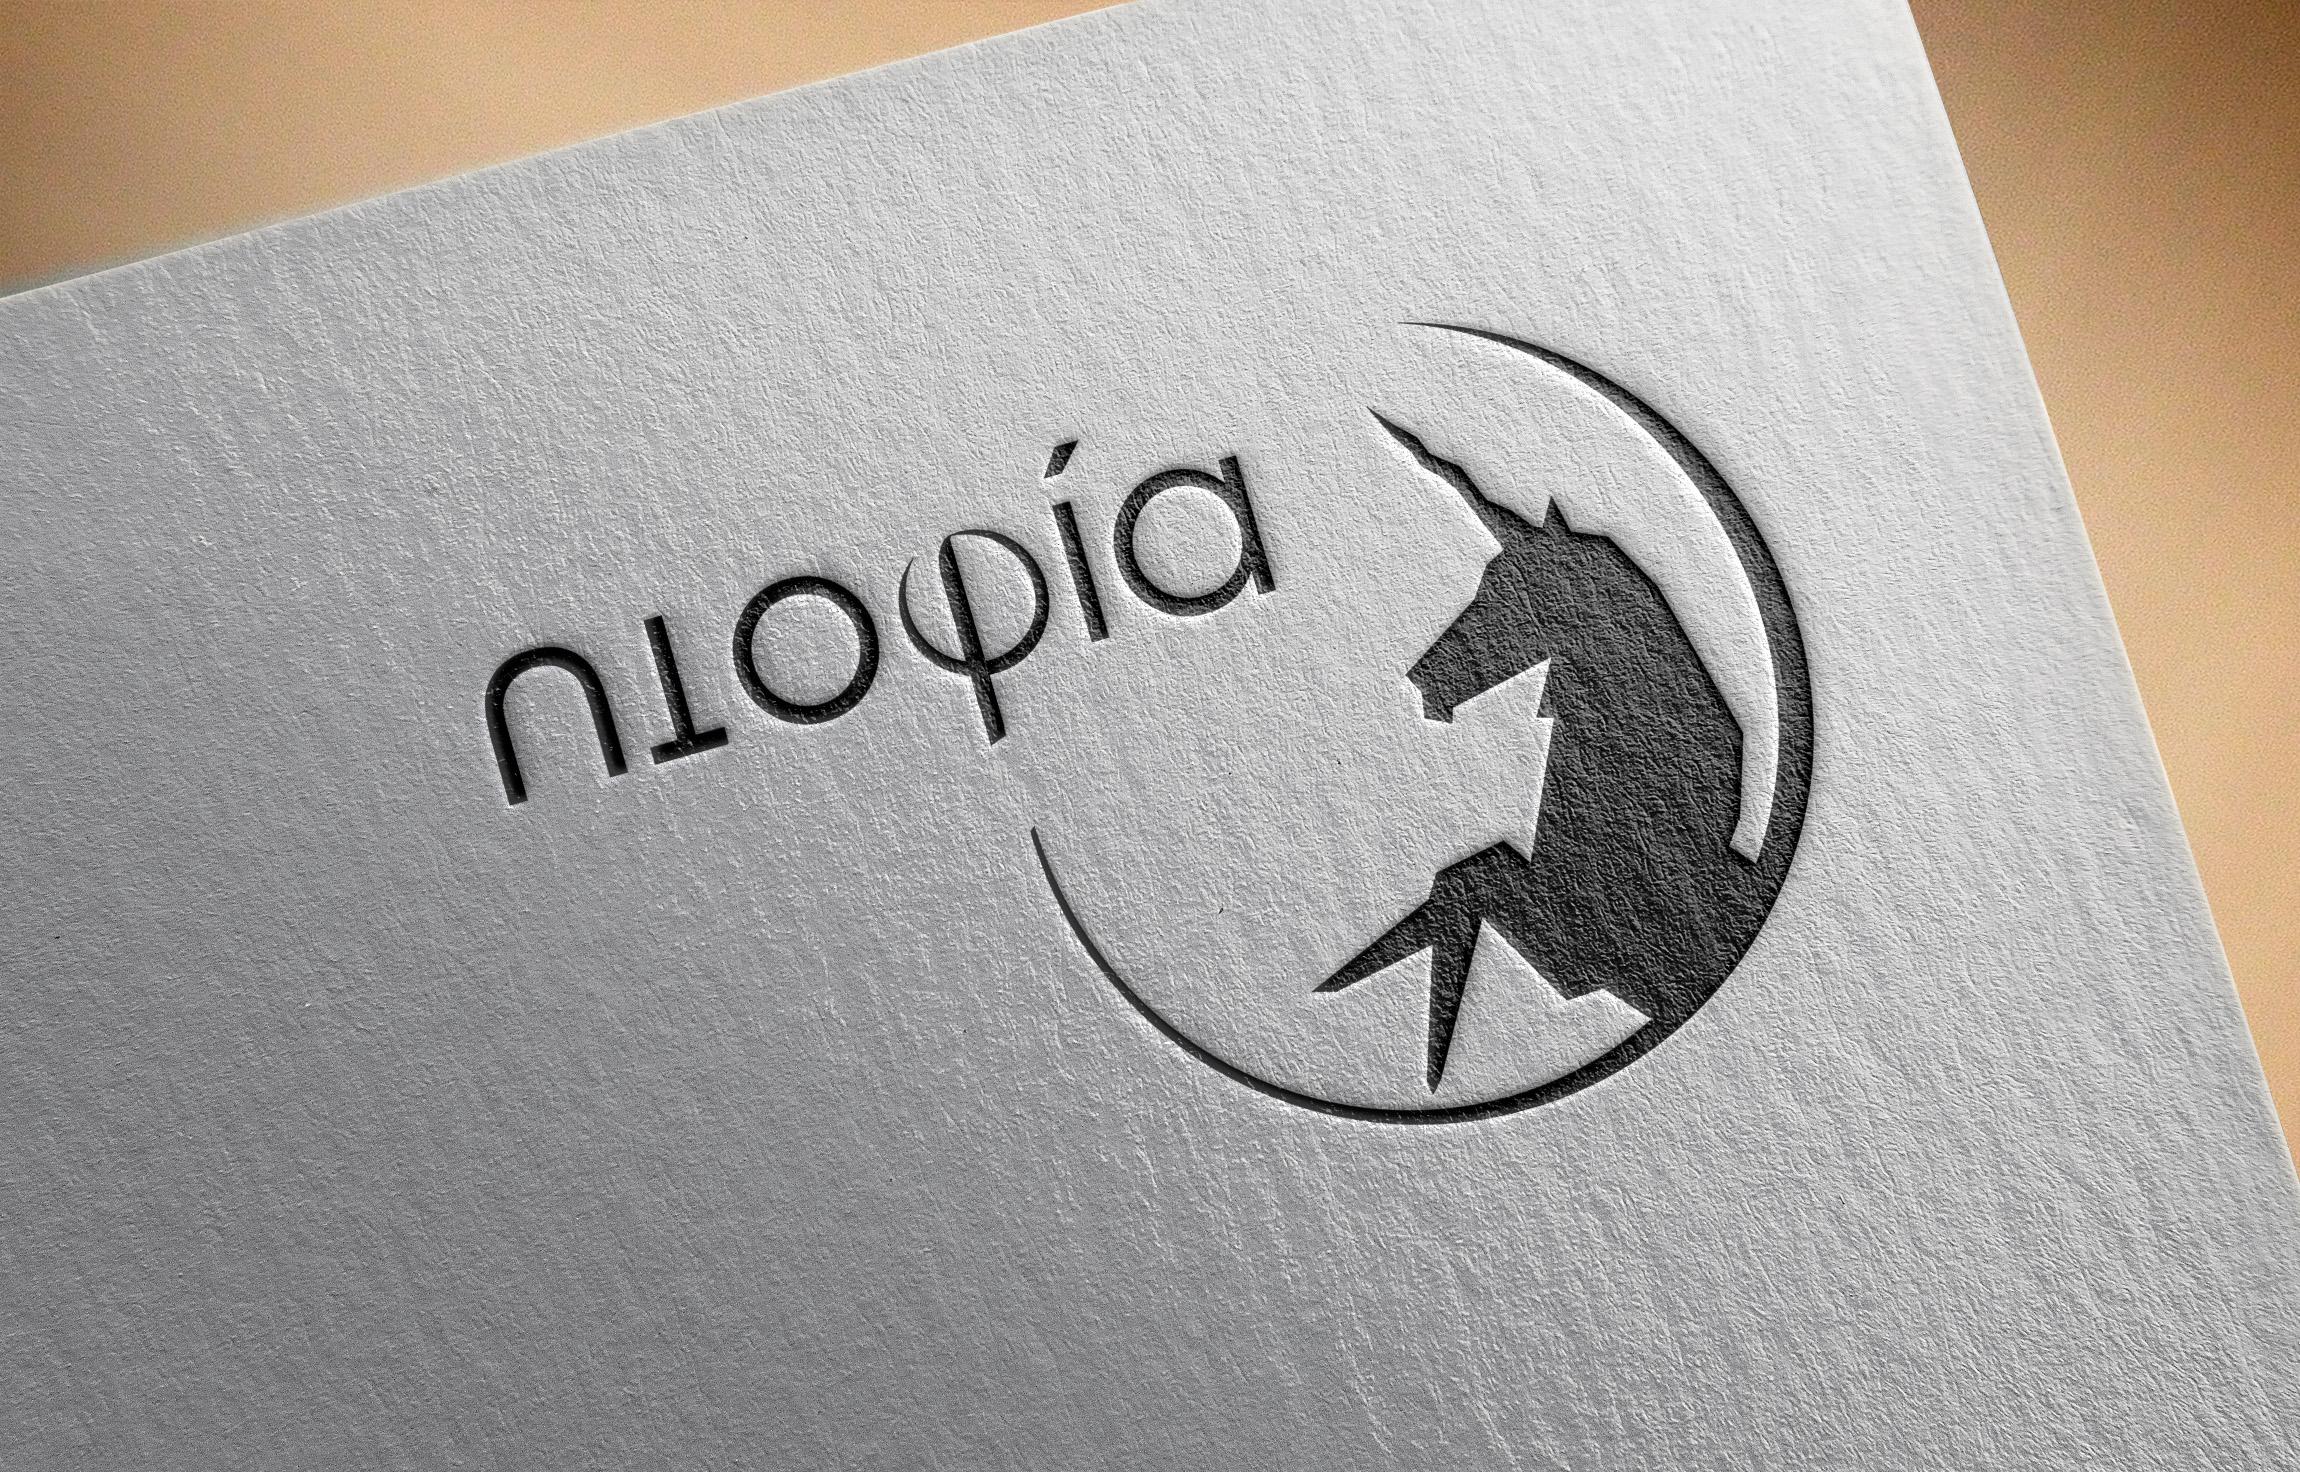 01_Utophia Ed logo design by Pau Vitti